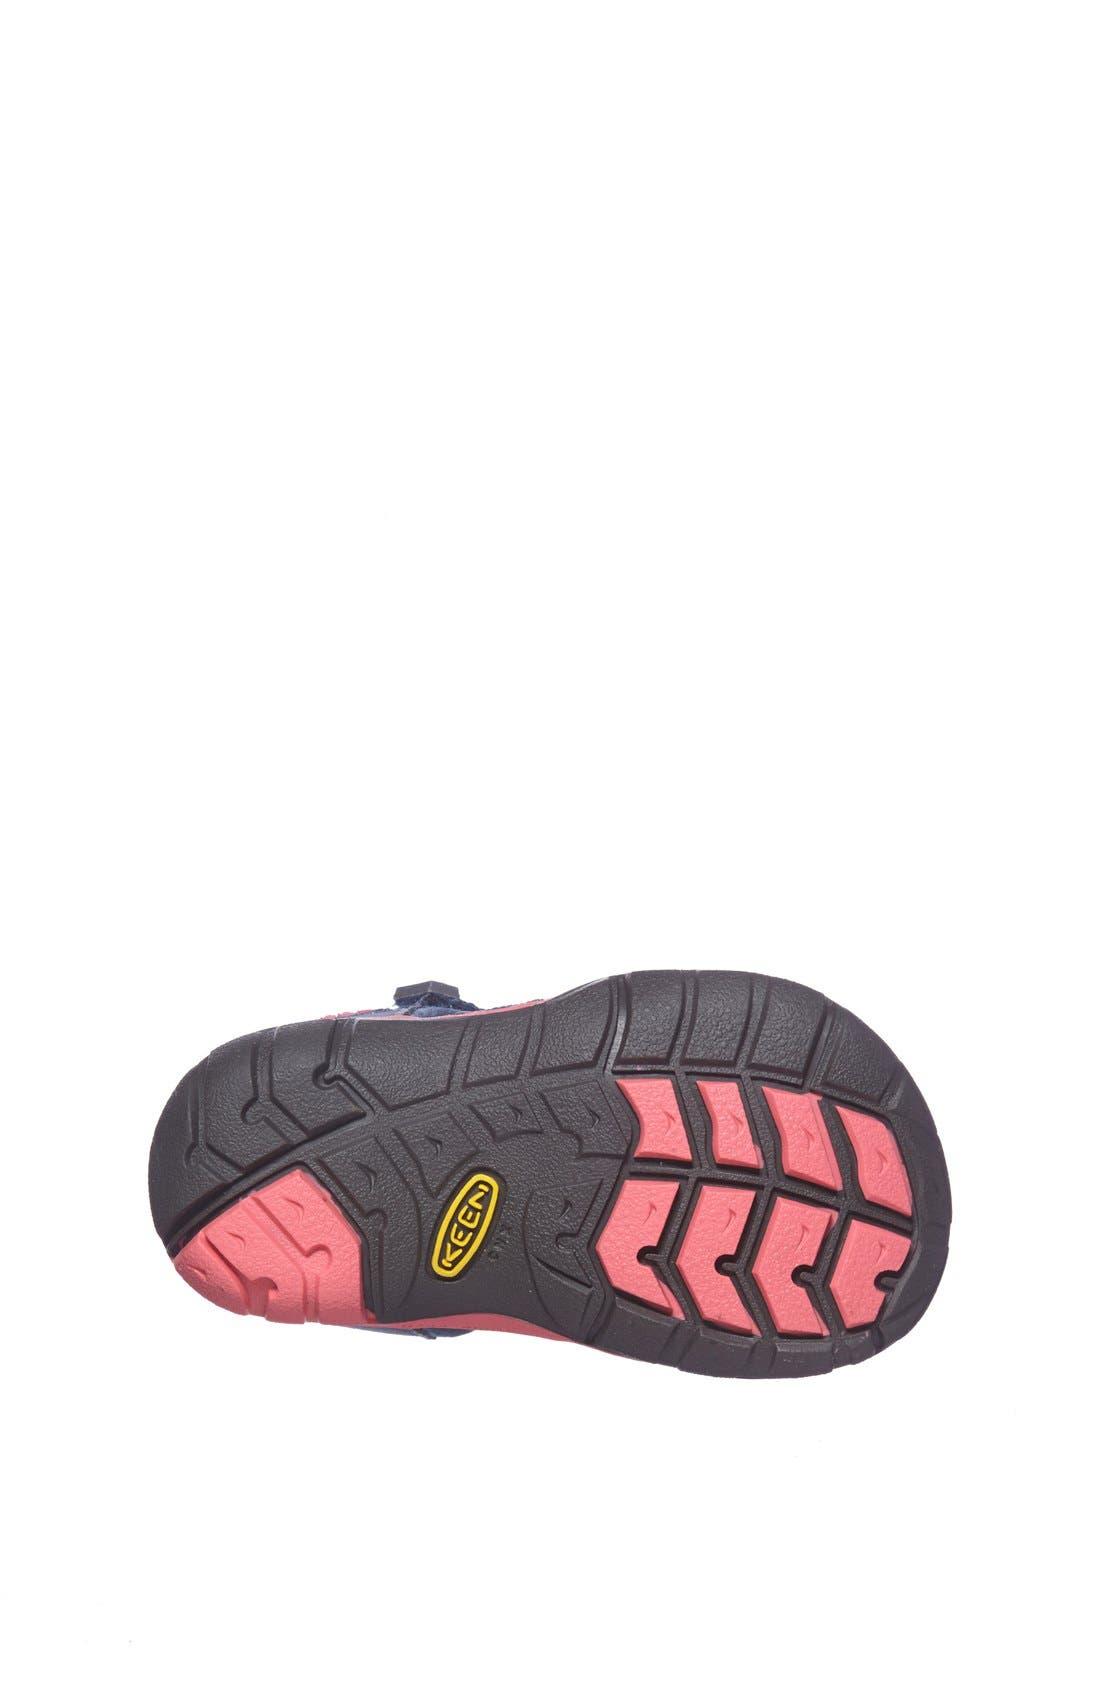 'Seacamp II' Waterproof Sandal,                             Alternate thumbnail 4, color,                             415